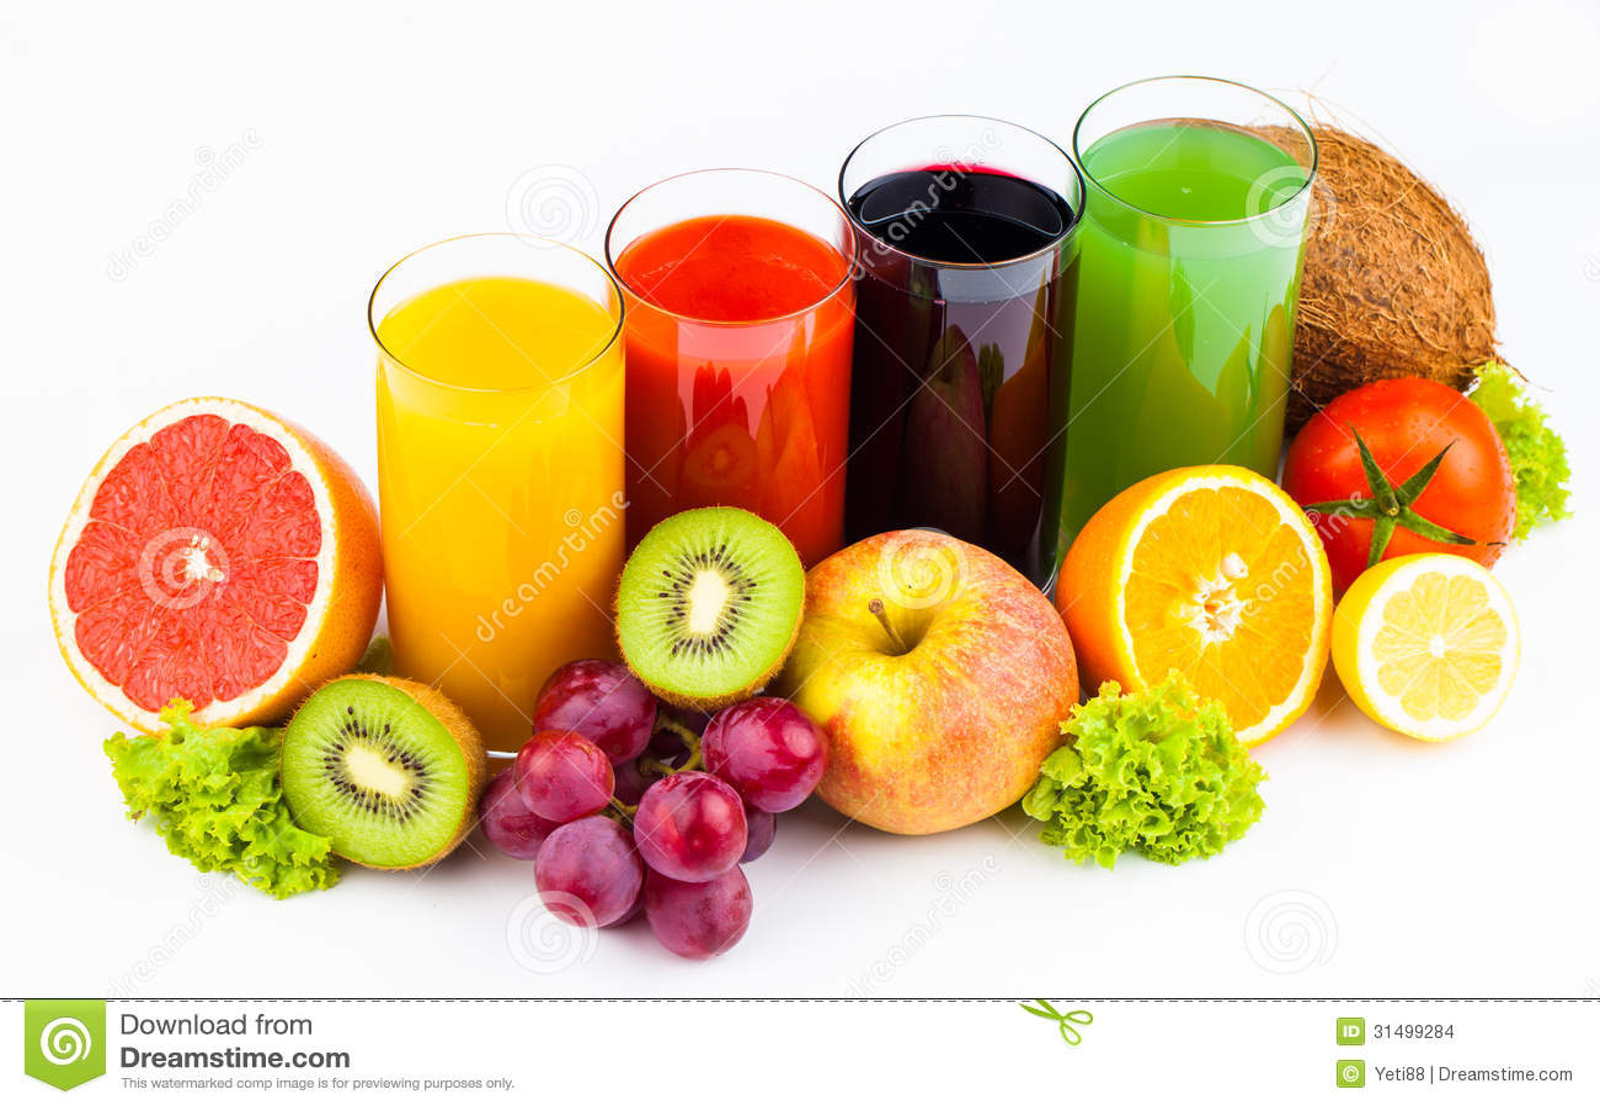 Download Fresh Juices Isolated On White Stock Photo - Image of cocktail, kiwi: 31499284